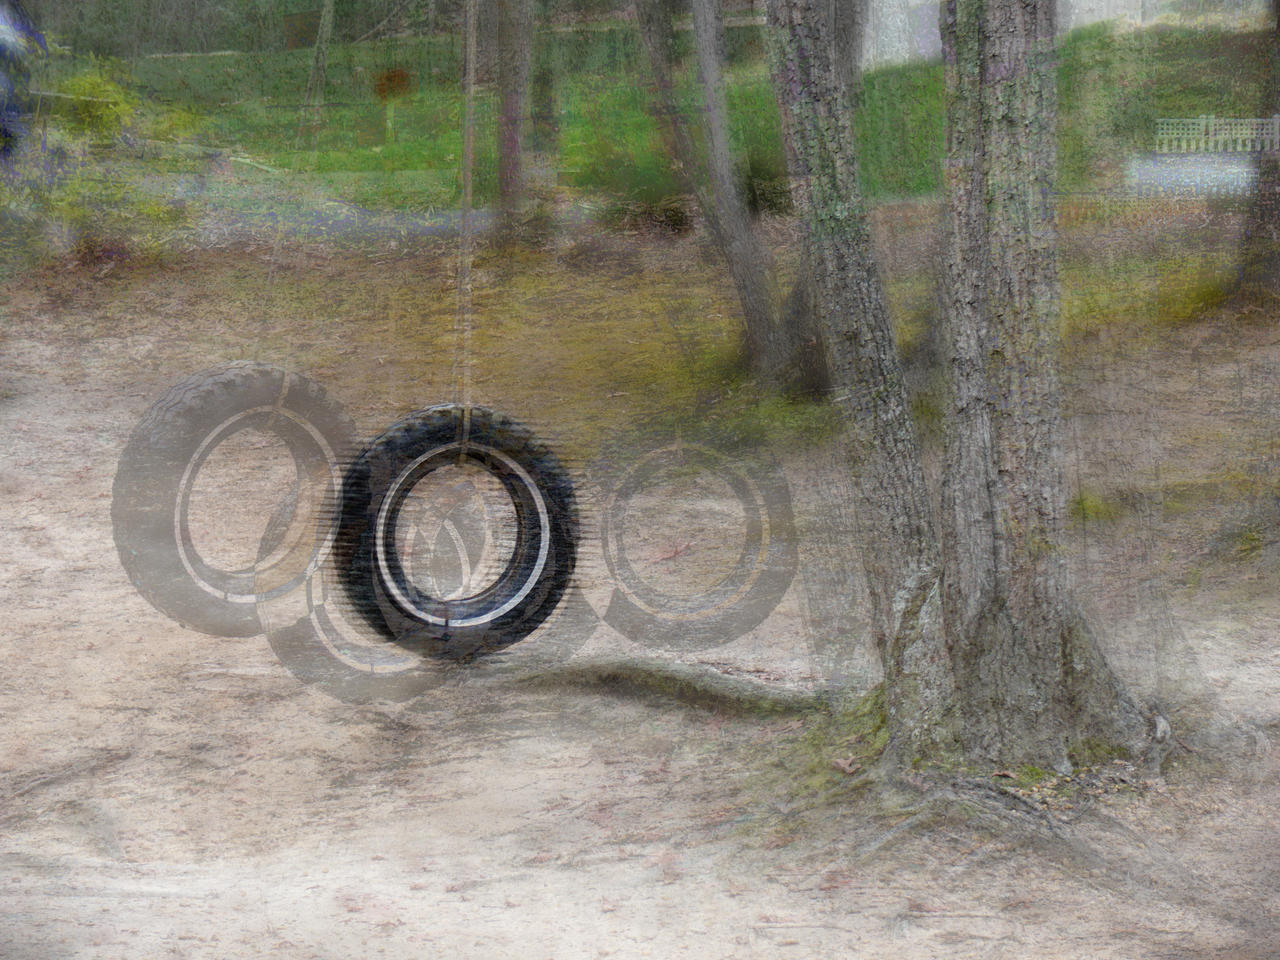 Moving Tire by cvramen